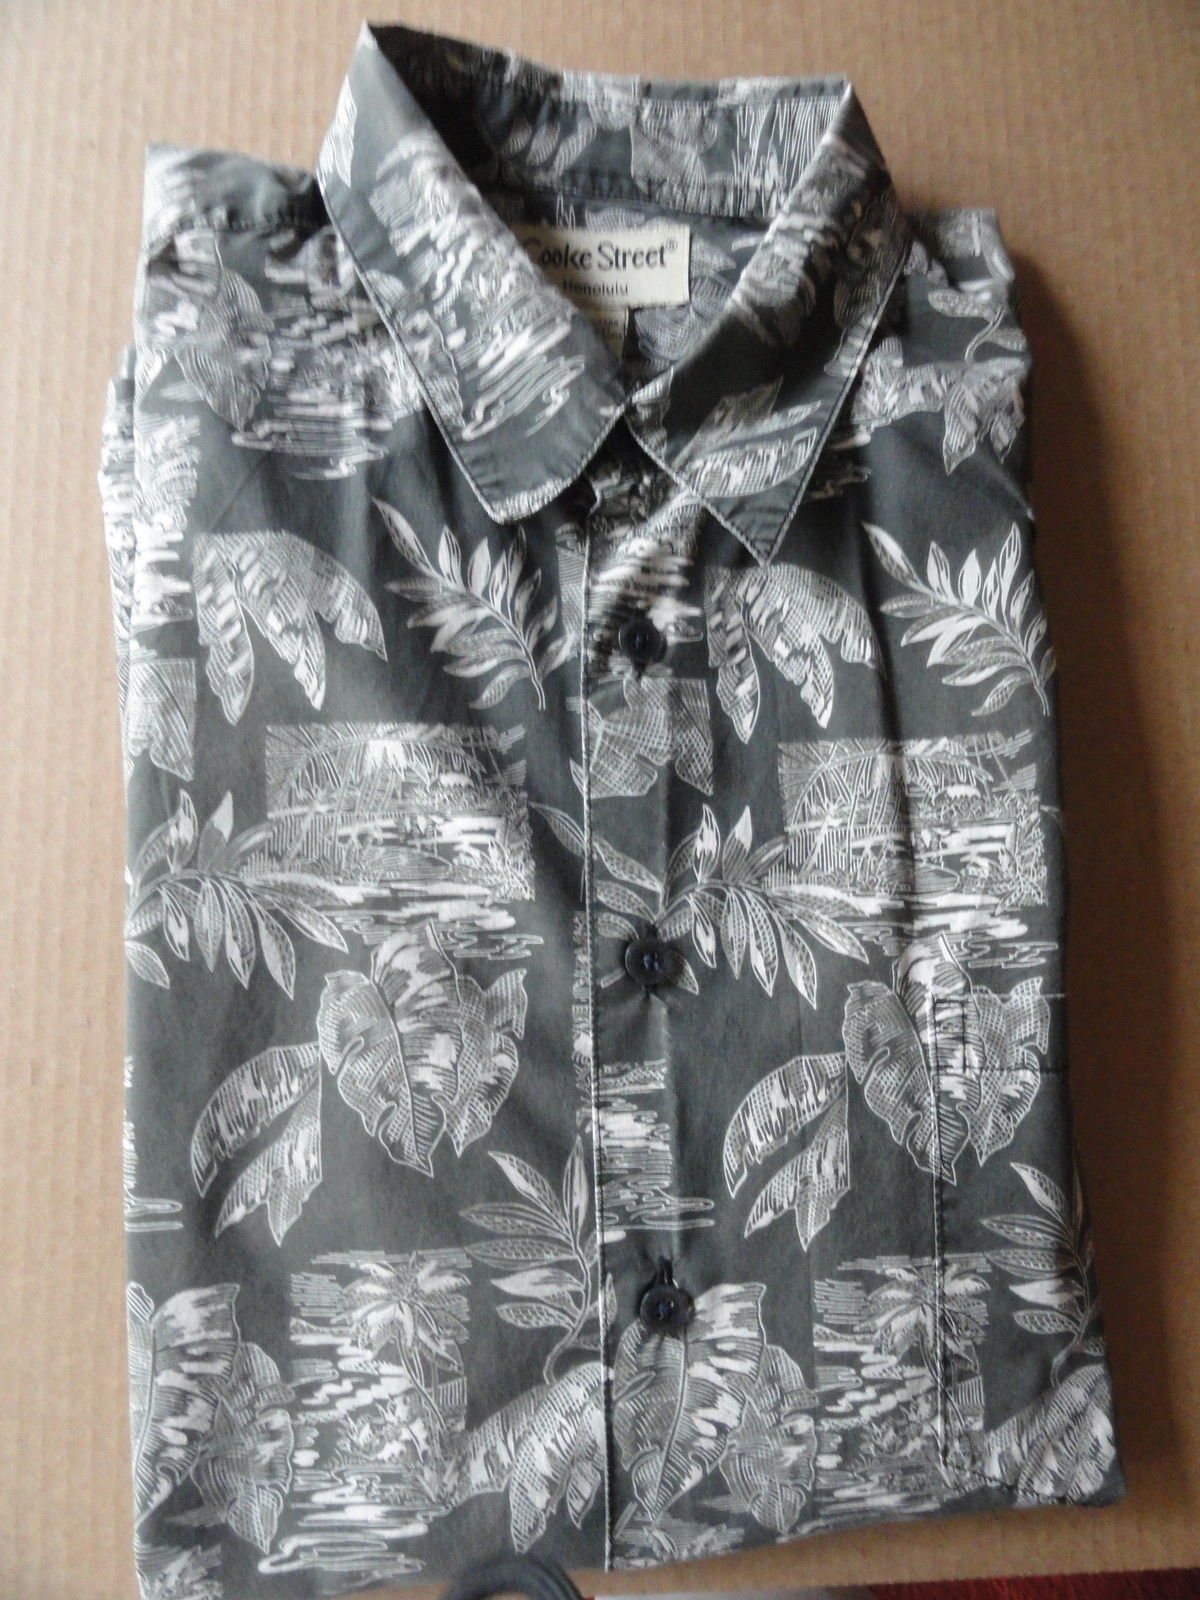 b5dba2be S l1600. S l1600. Previous. Man's Gray White XL Banana Leaf Print Hawaiian  Shirt Cooke Street Honolulu